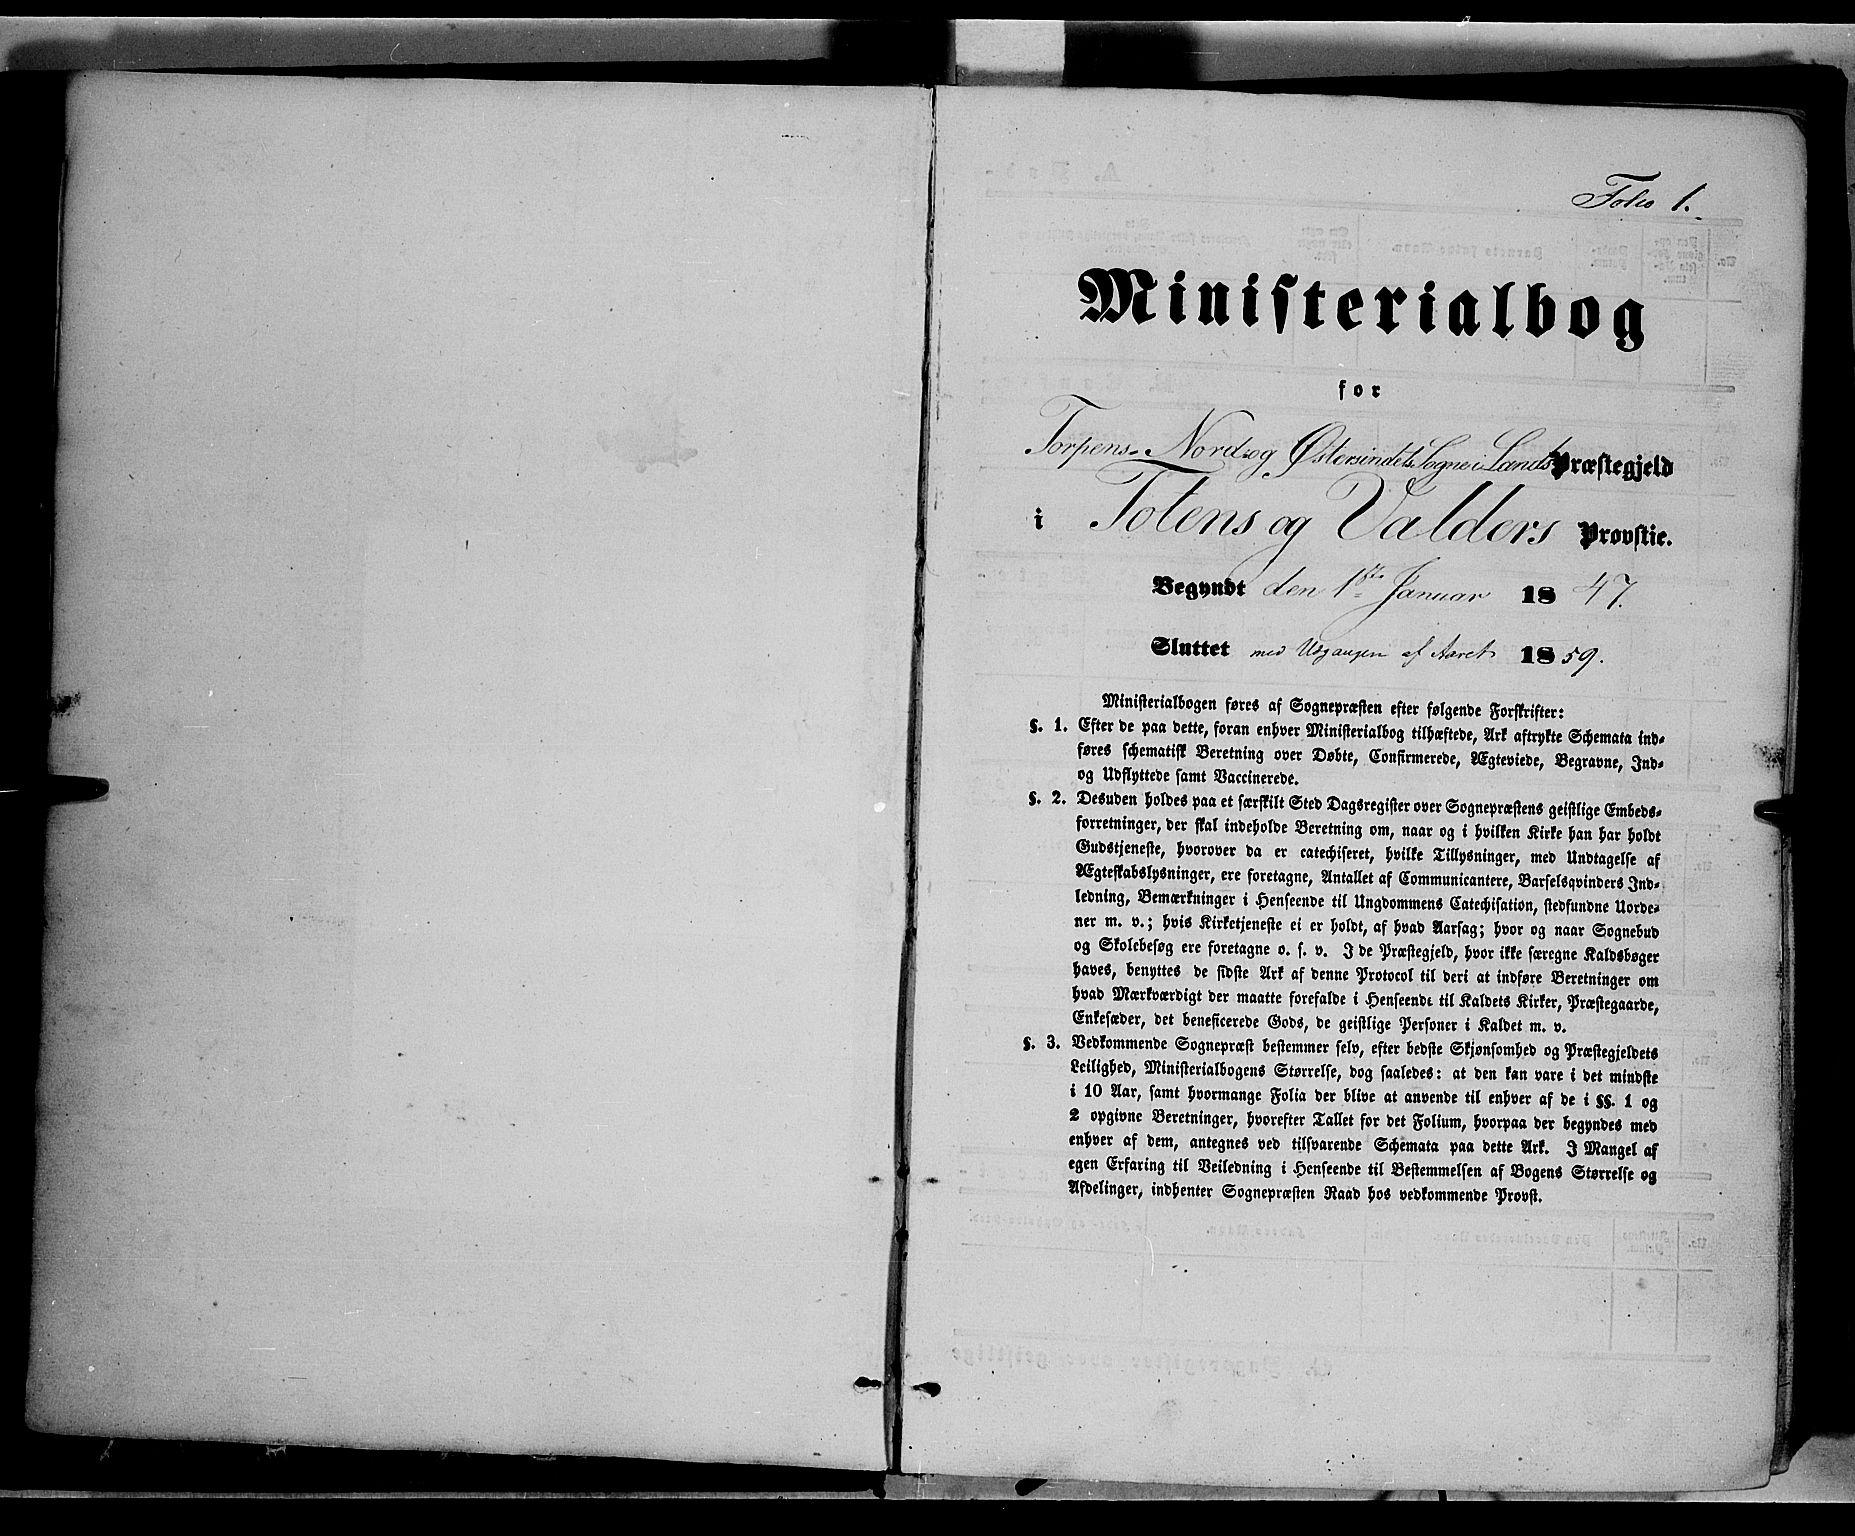 SAH, Land prestekontor, Ministerialbok nr. 10, 1847-1859, s. 1